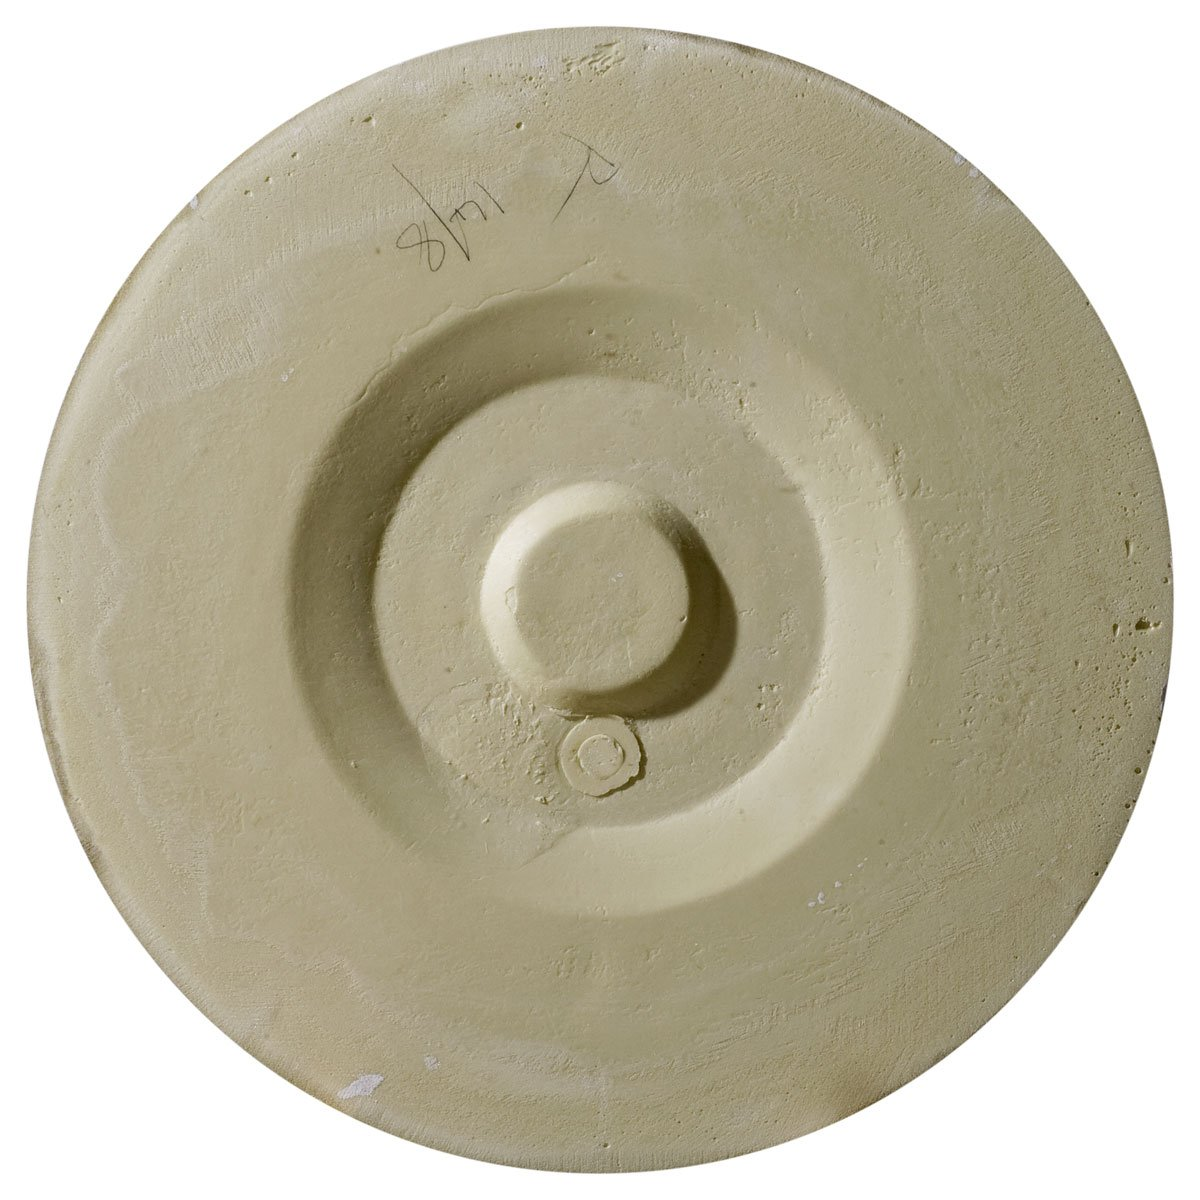 Ekena Millwork CM21RE 21-Inch OD x 3 3/4-Inch ID x 1 1/4-Inch P Reece Ceiling Medallion by Ekena Millwork (Image #4)